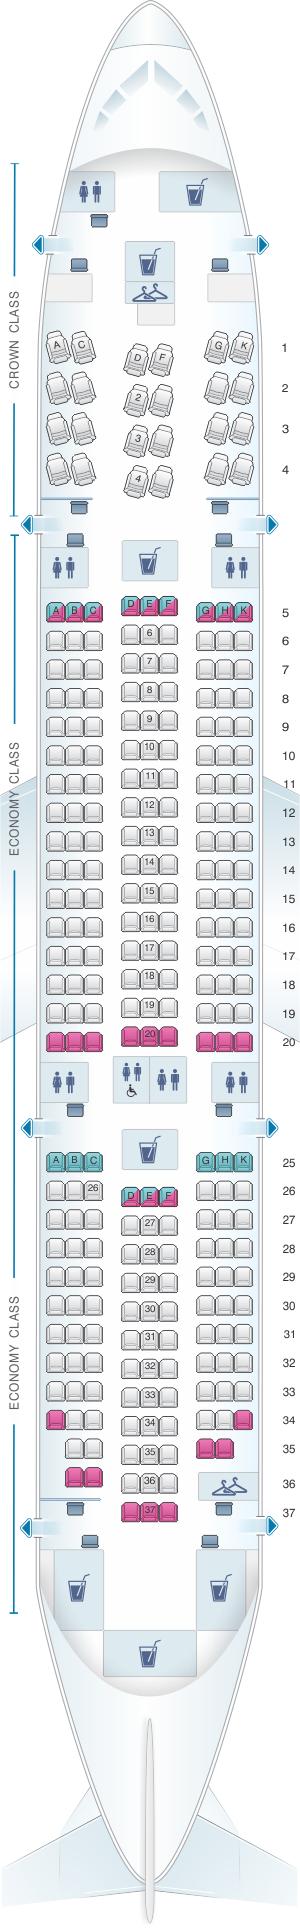 Seat map for Royal Jordanian Boeing B787-8 Dreamliner